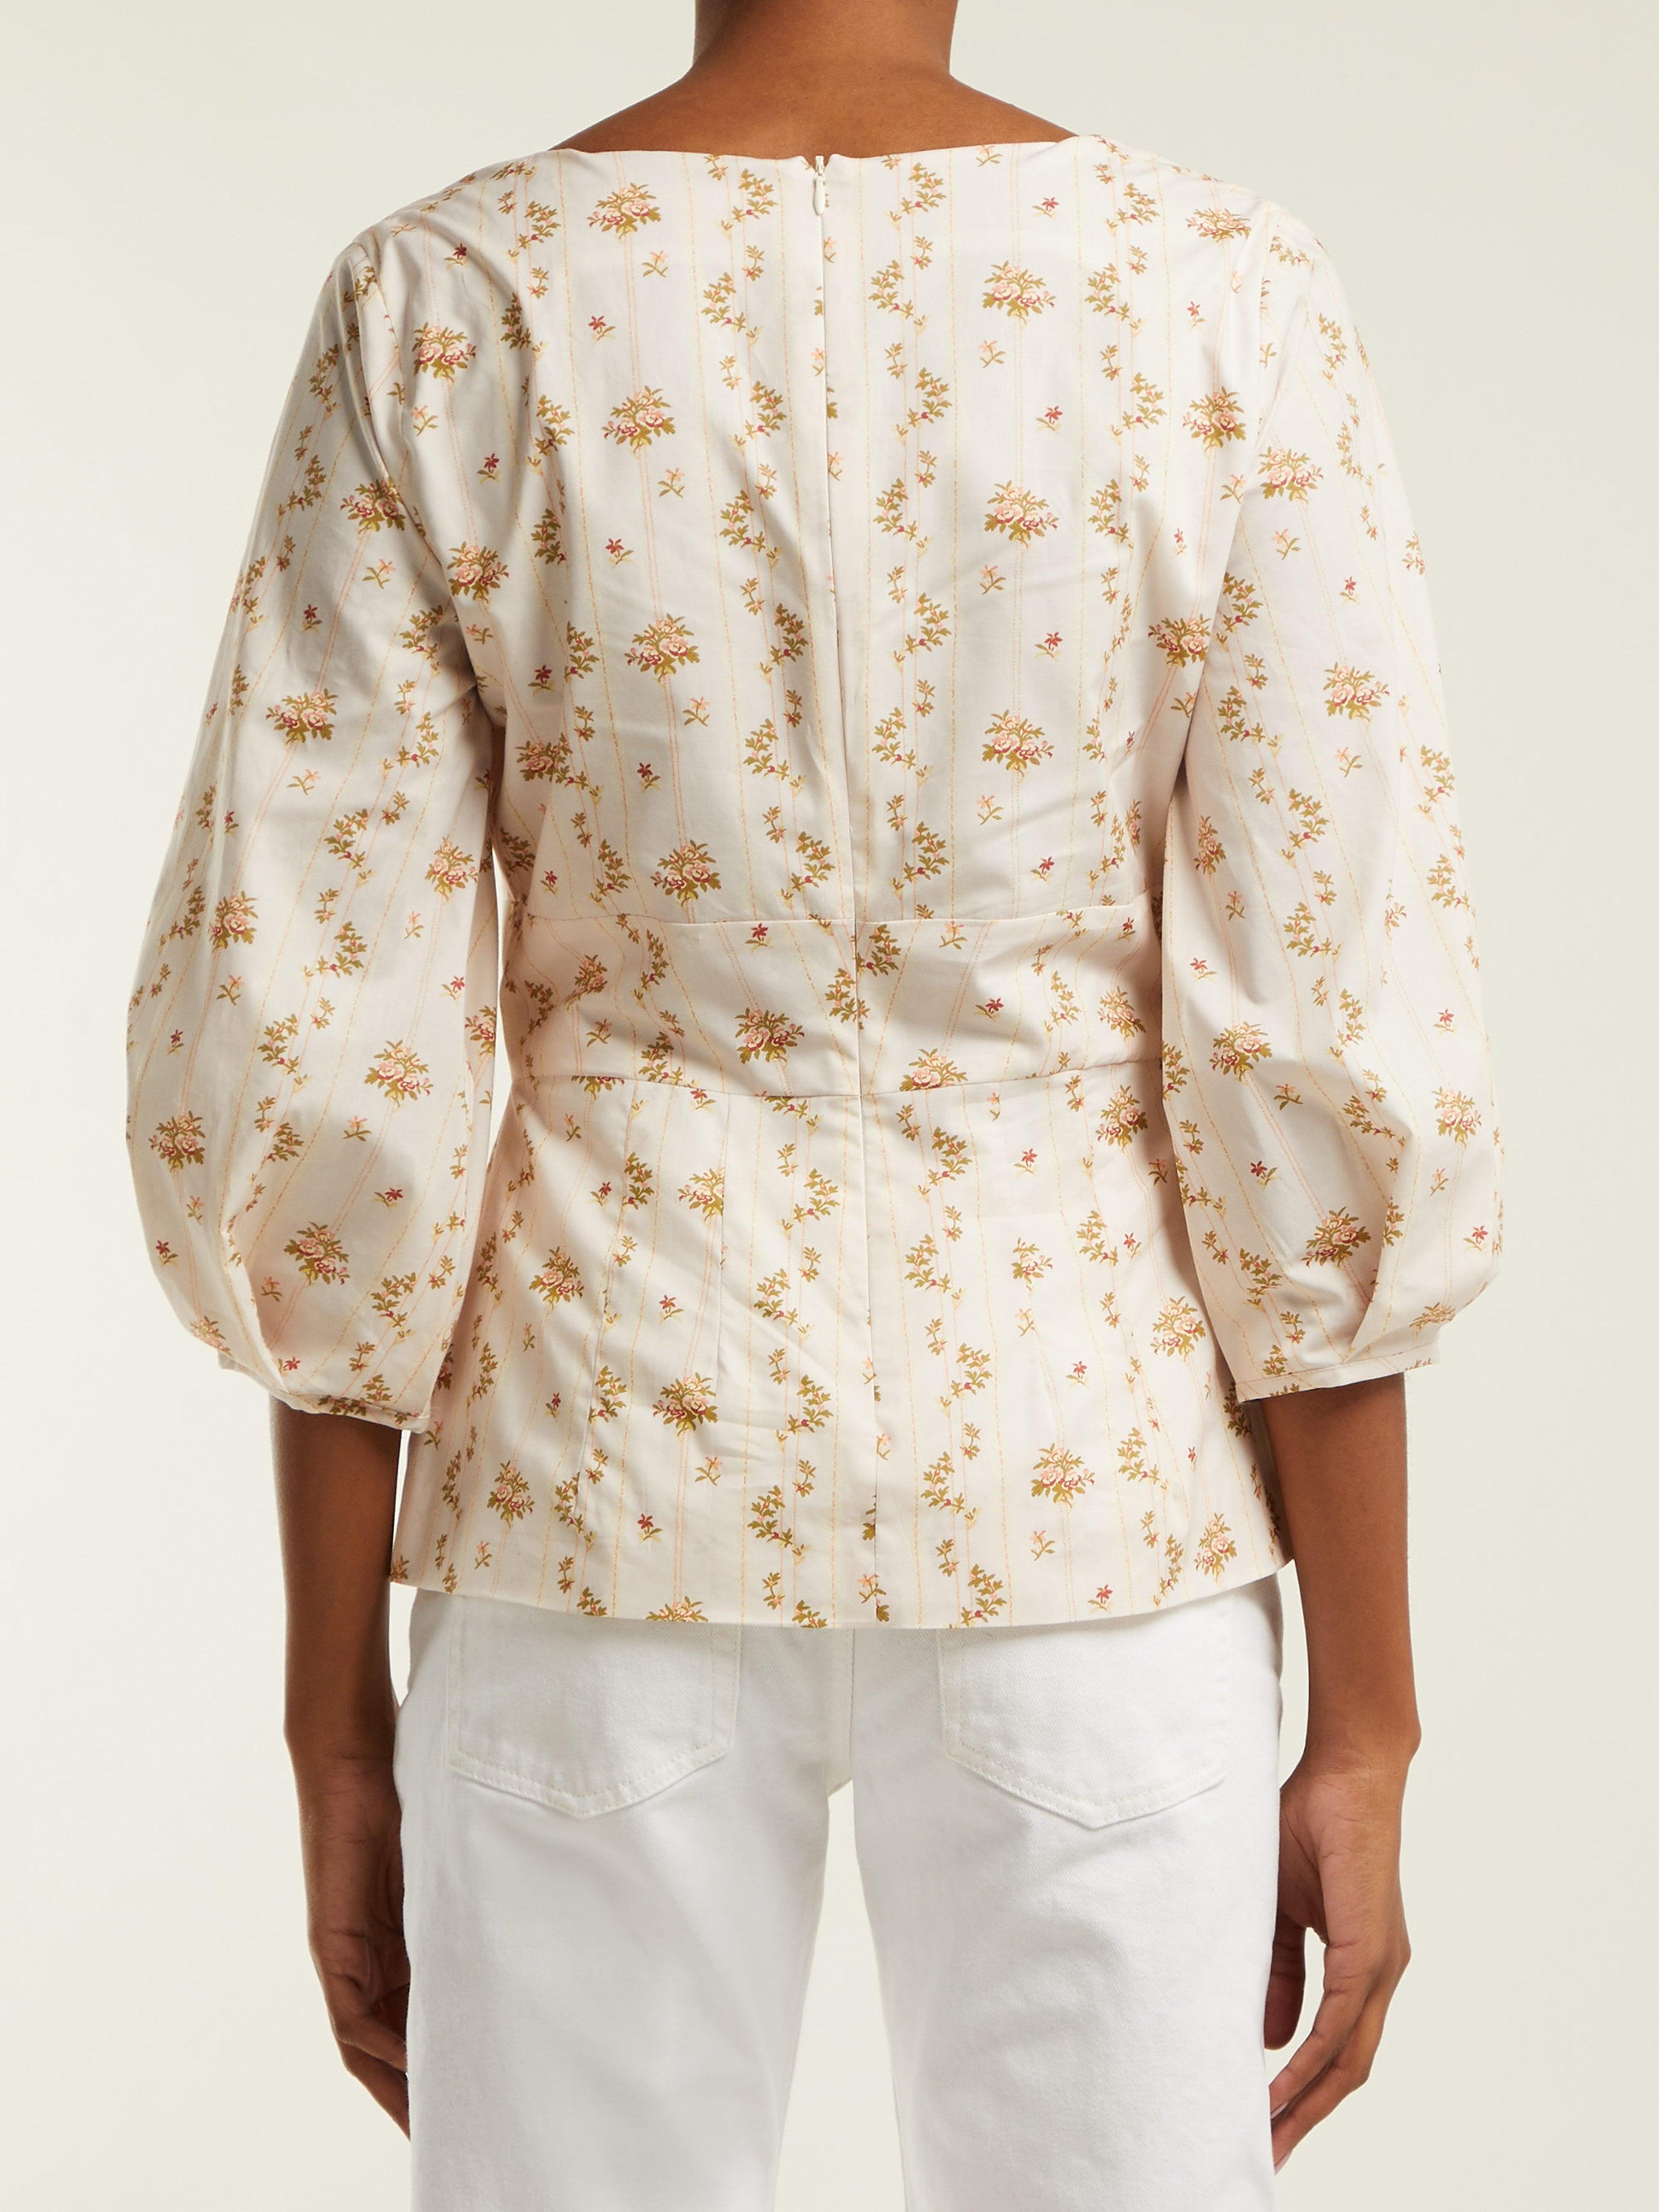 Haut en coton à imprimé fleuri Orrechino Brock Collection en coloris Blanc